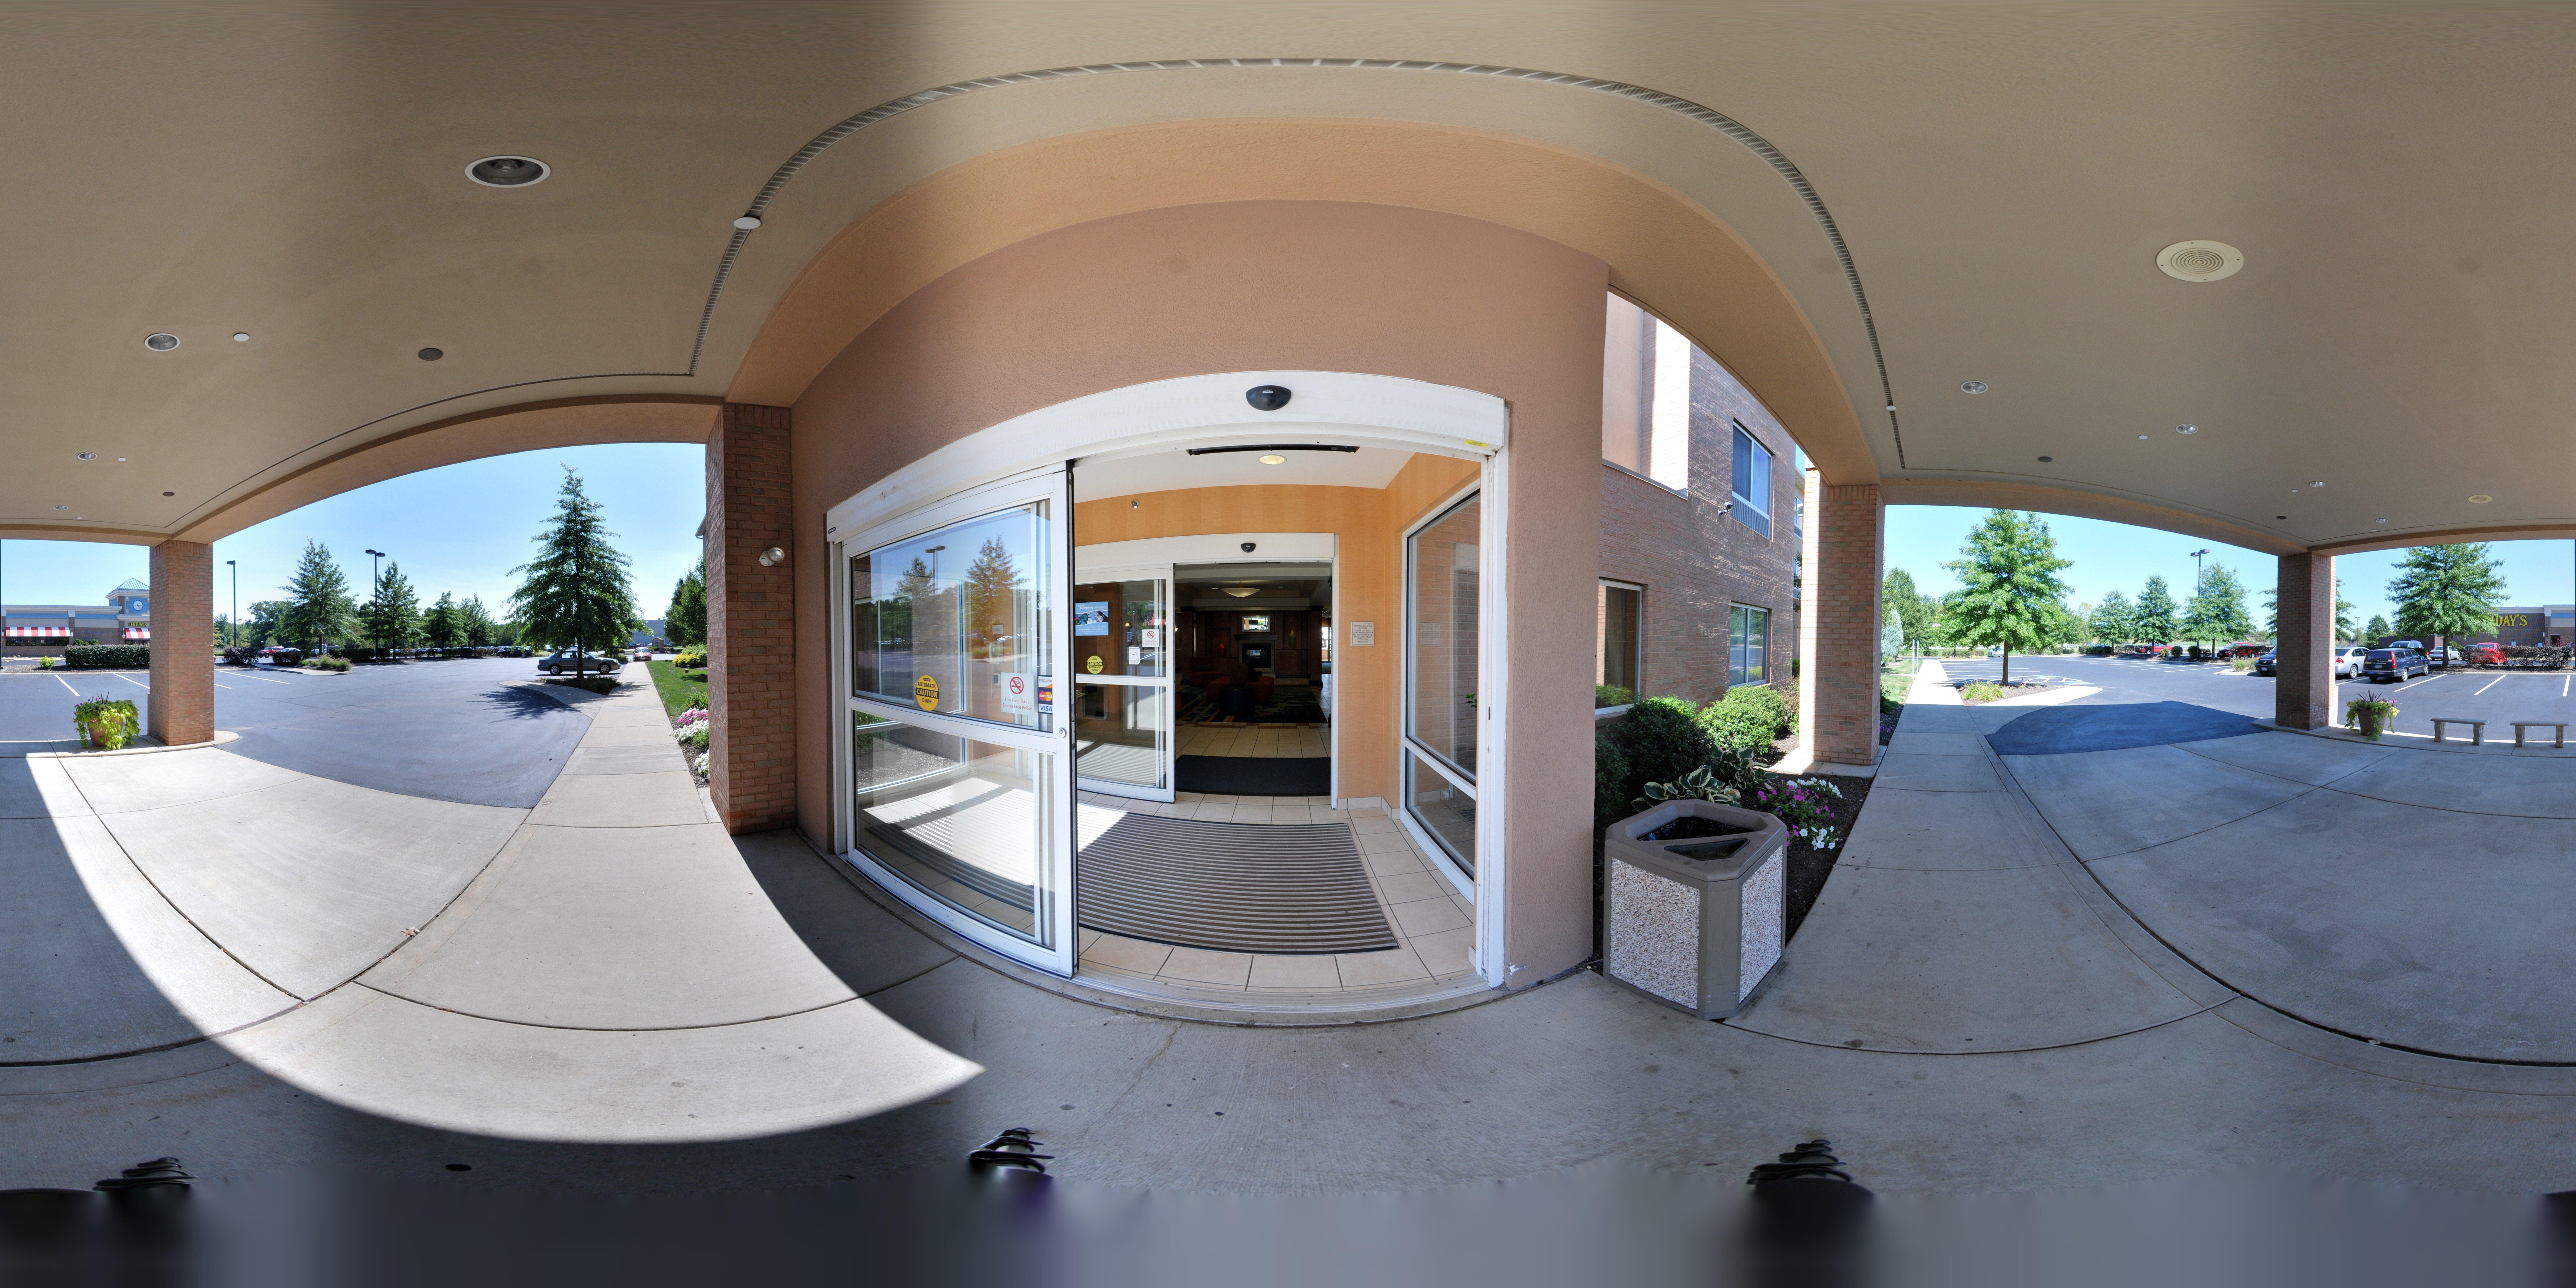 Fairfield Inn & Suites by Marriott Akron South image 29